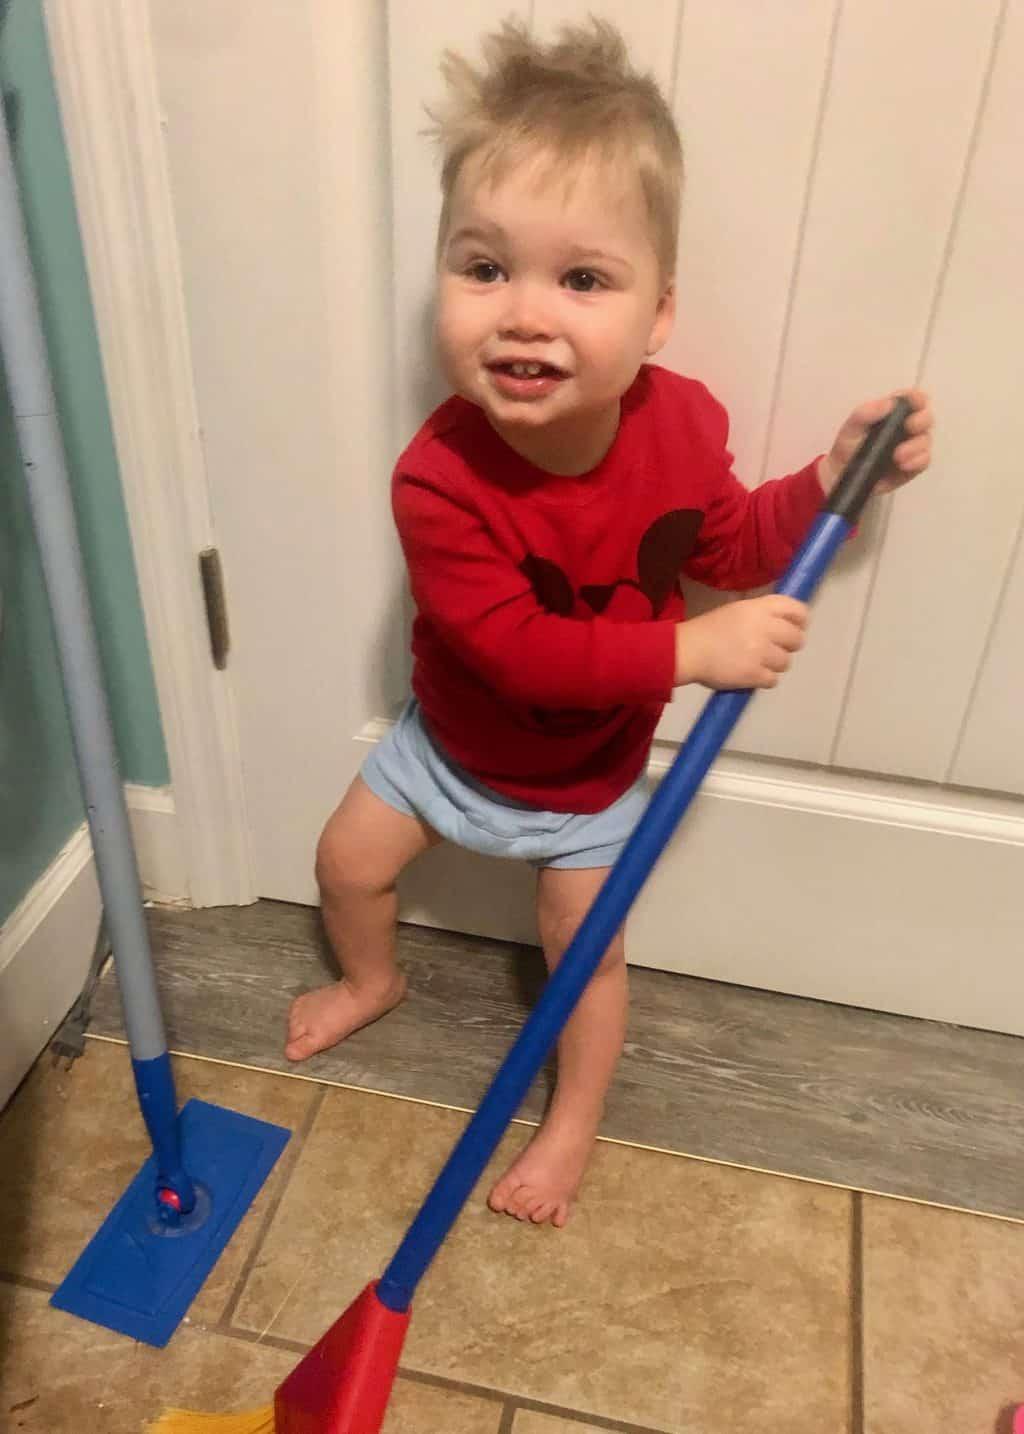 spear helping clean